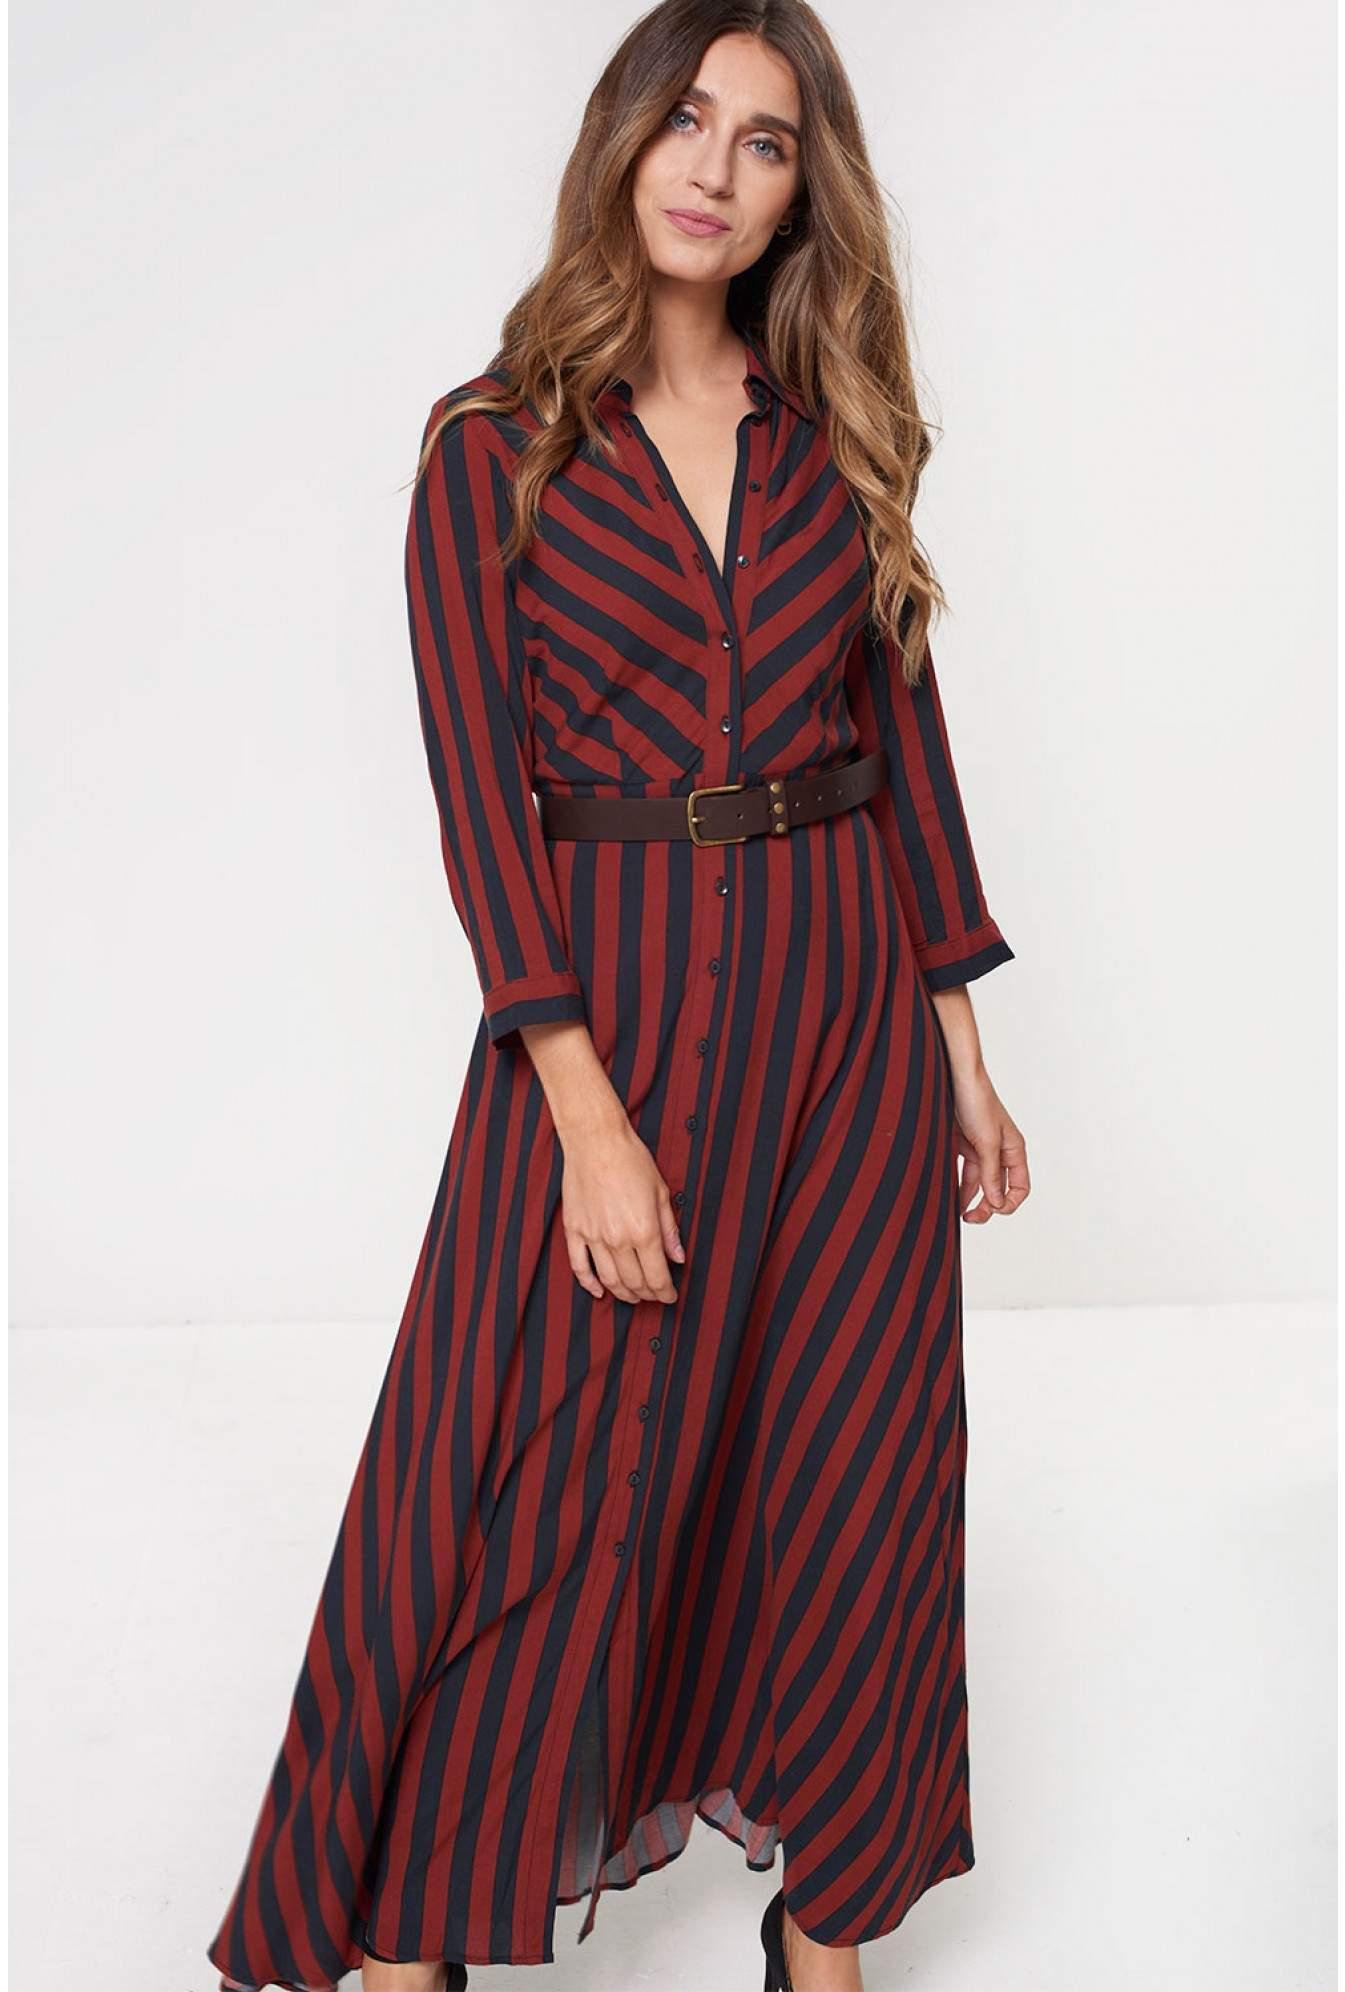 6165c10ac026 More Views. Savanna Long Sleeve Shirt Dress in Navy Stripe